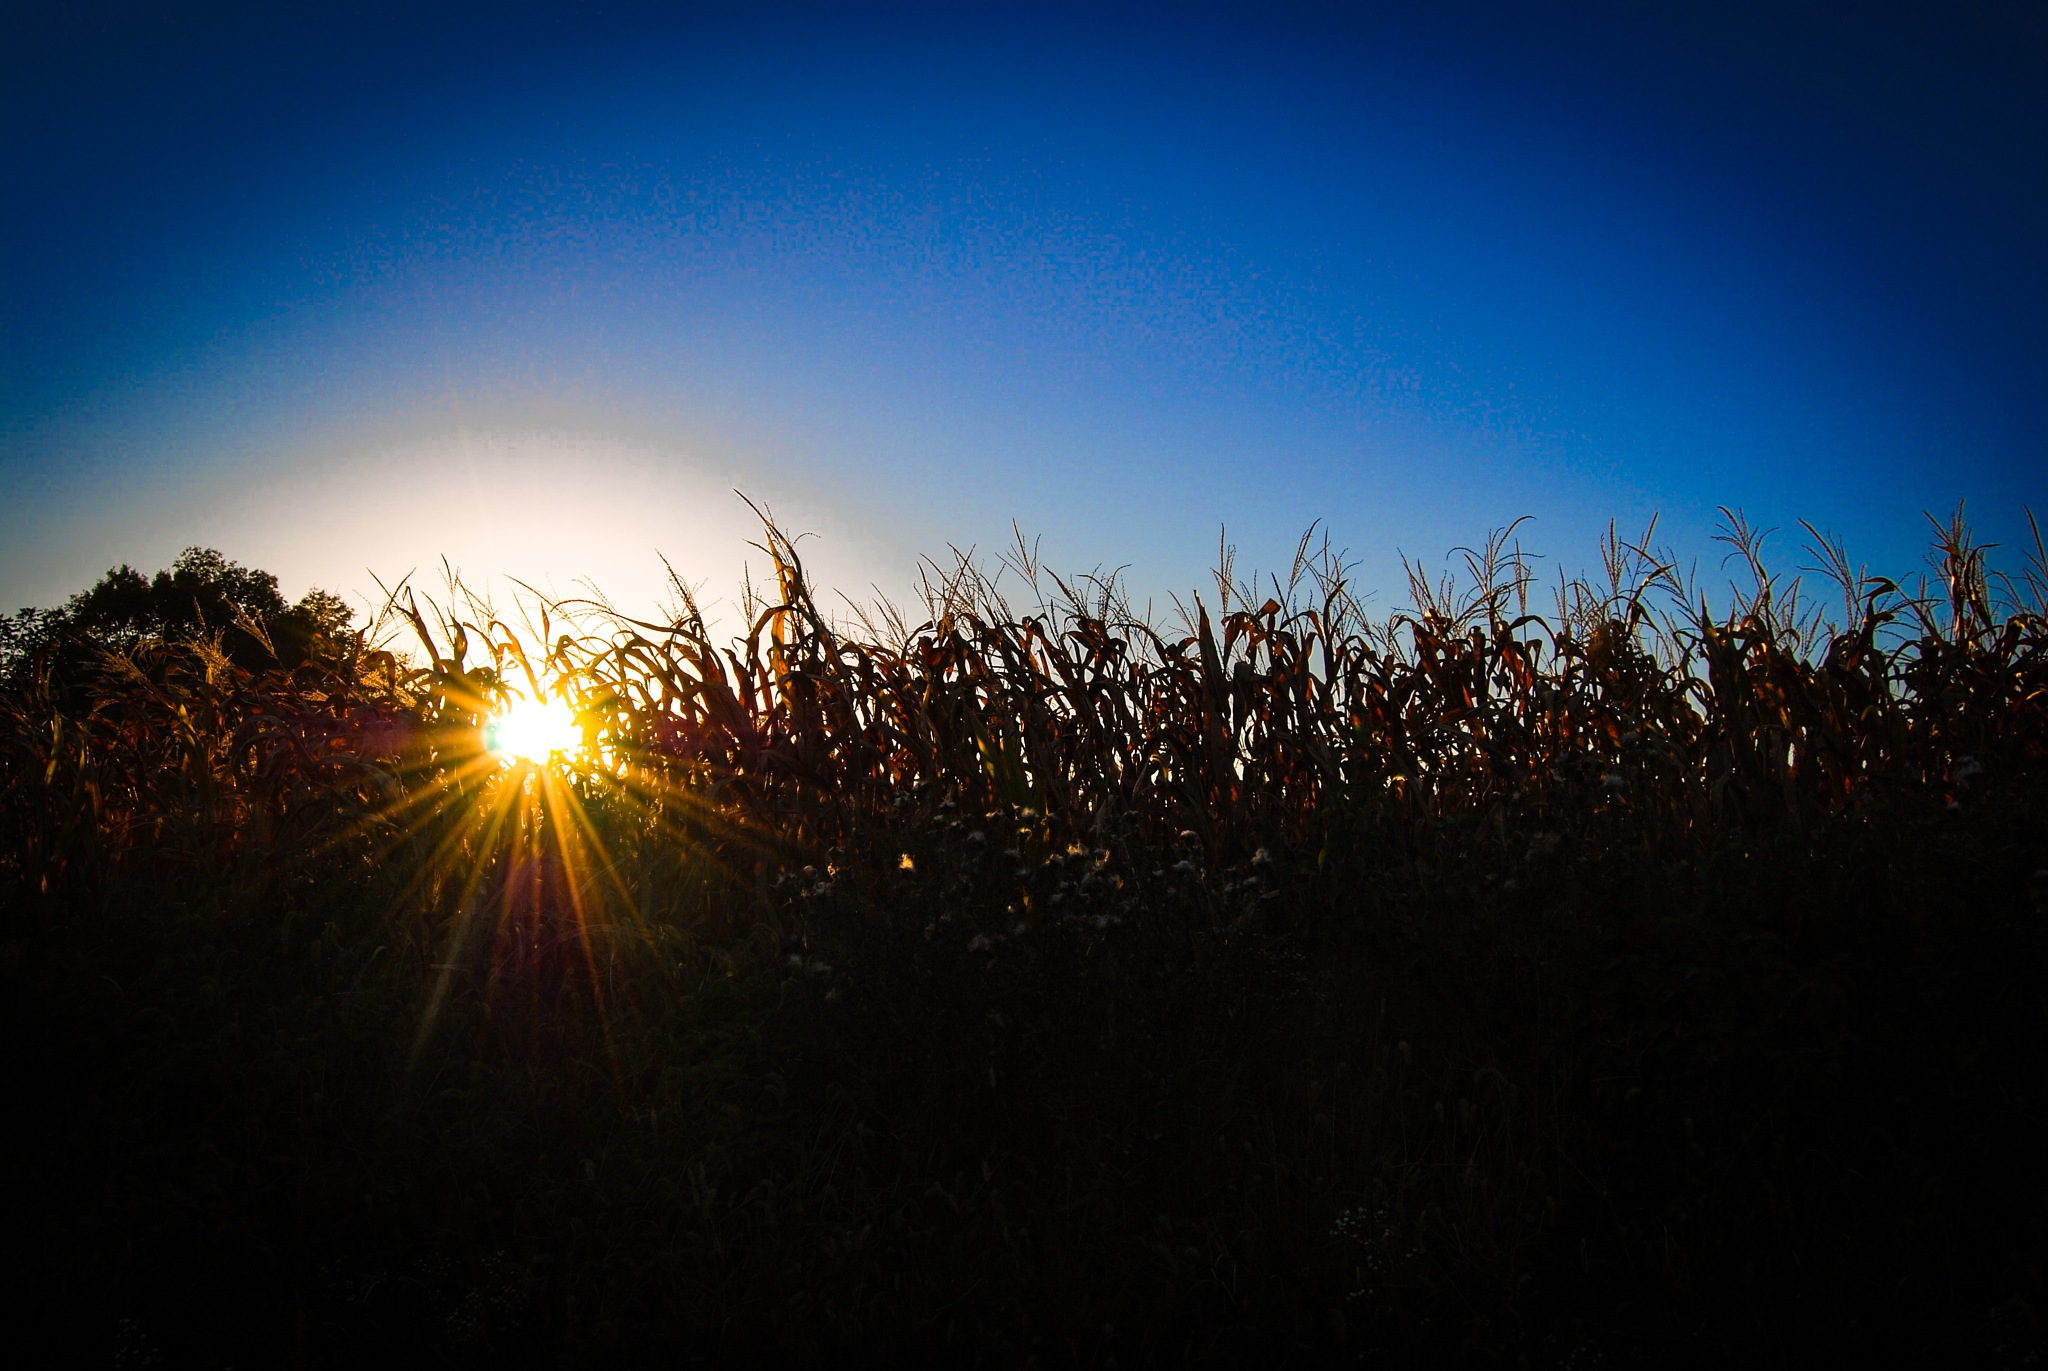 Cornfield Sunset by Amy Elizabeth